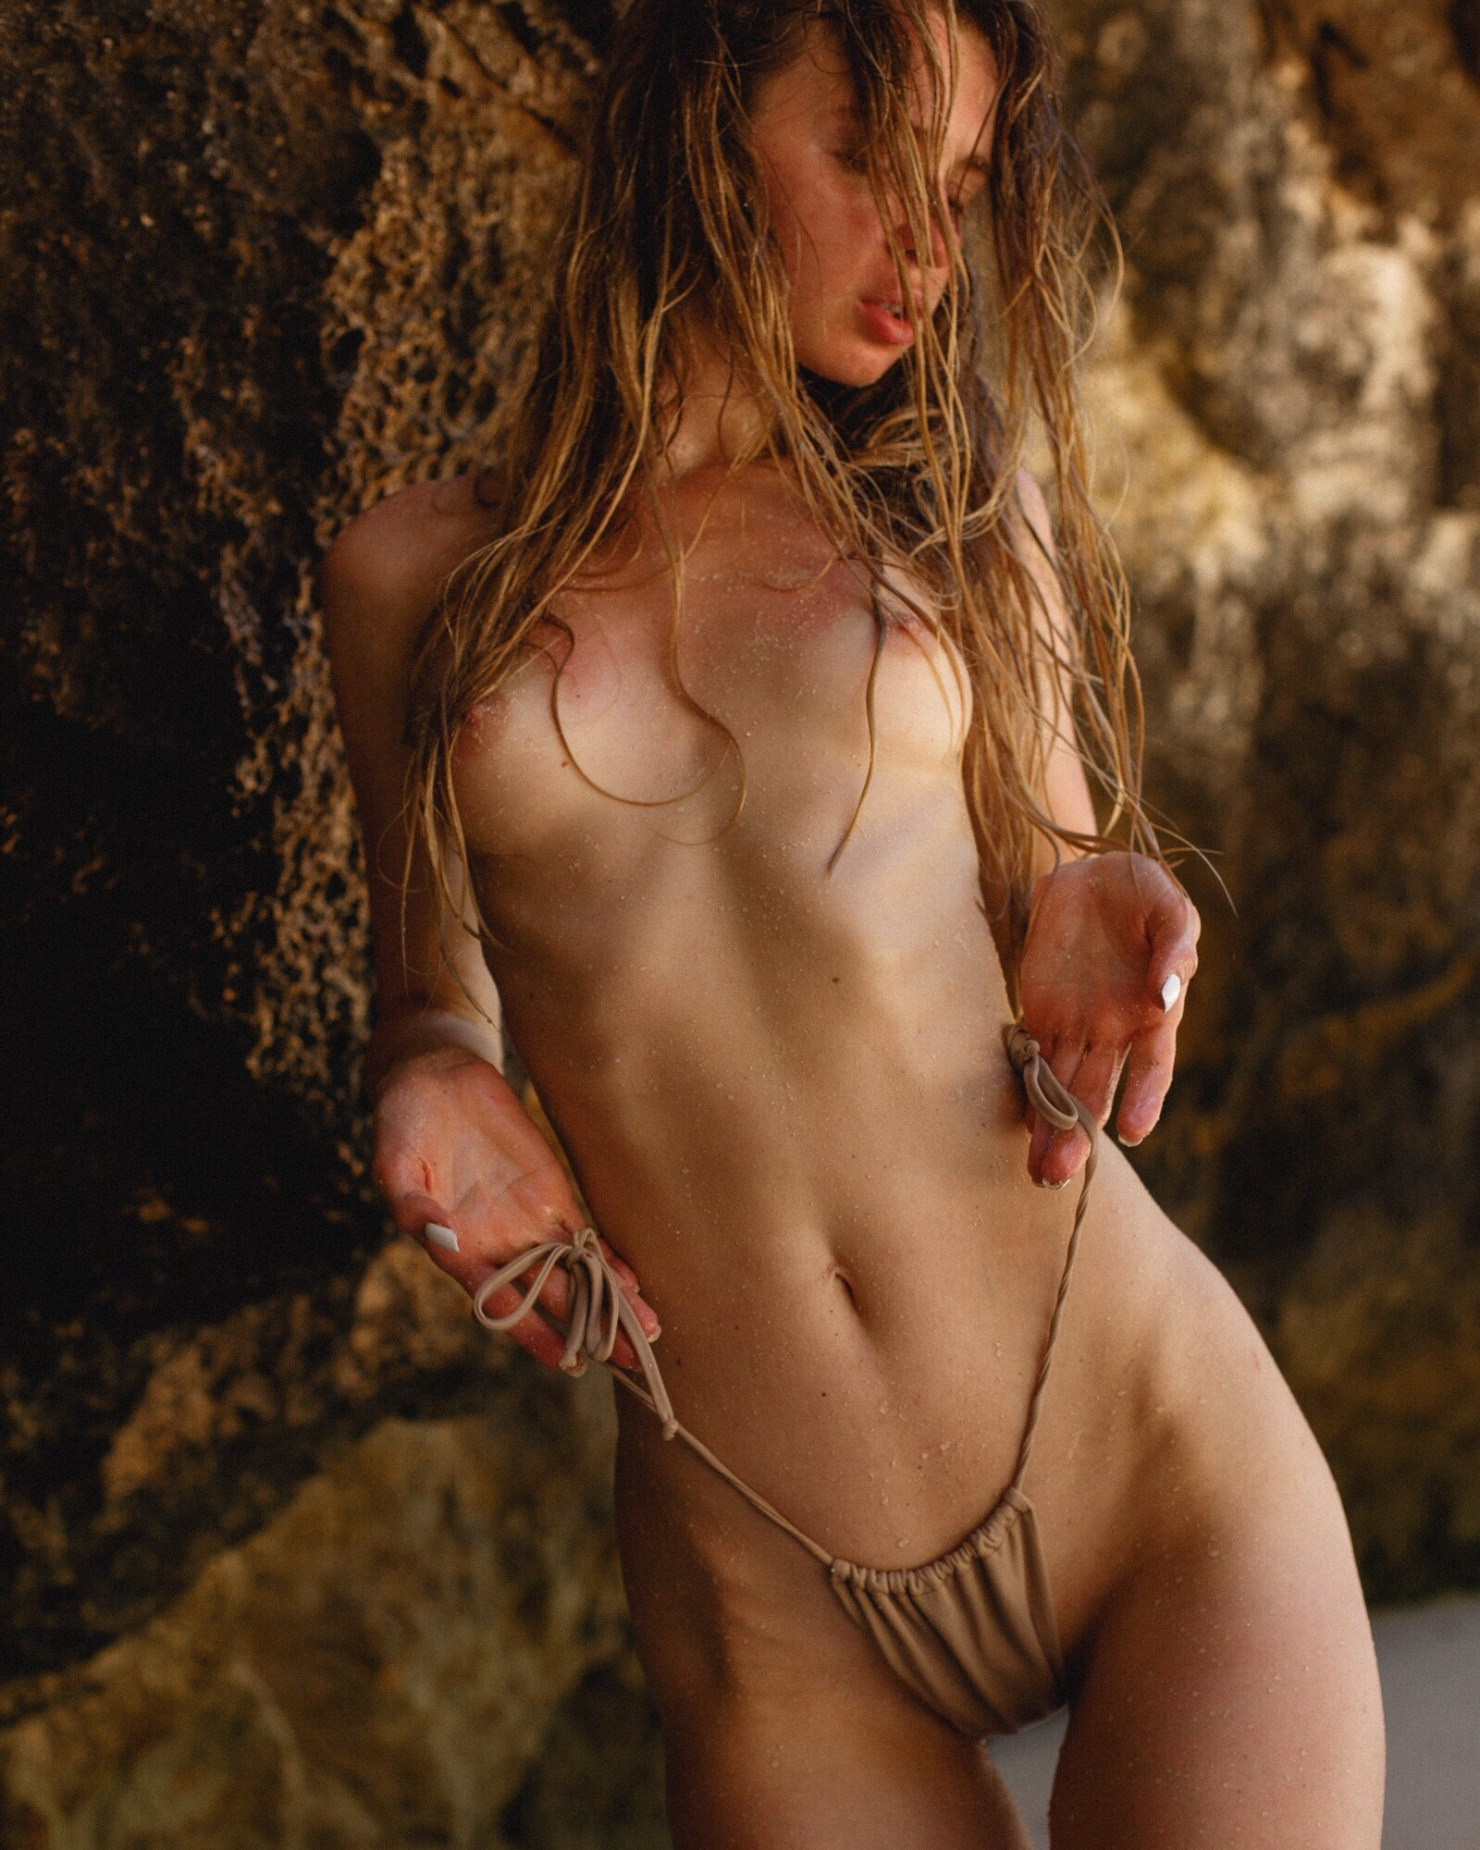 Ana Walczak Nude igor shevchuk - portraits of girls